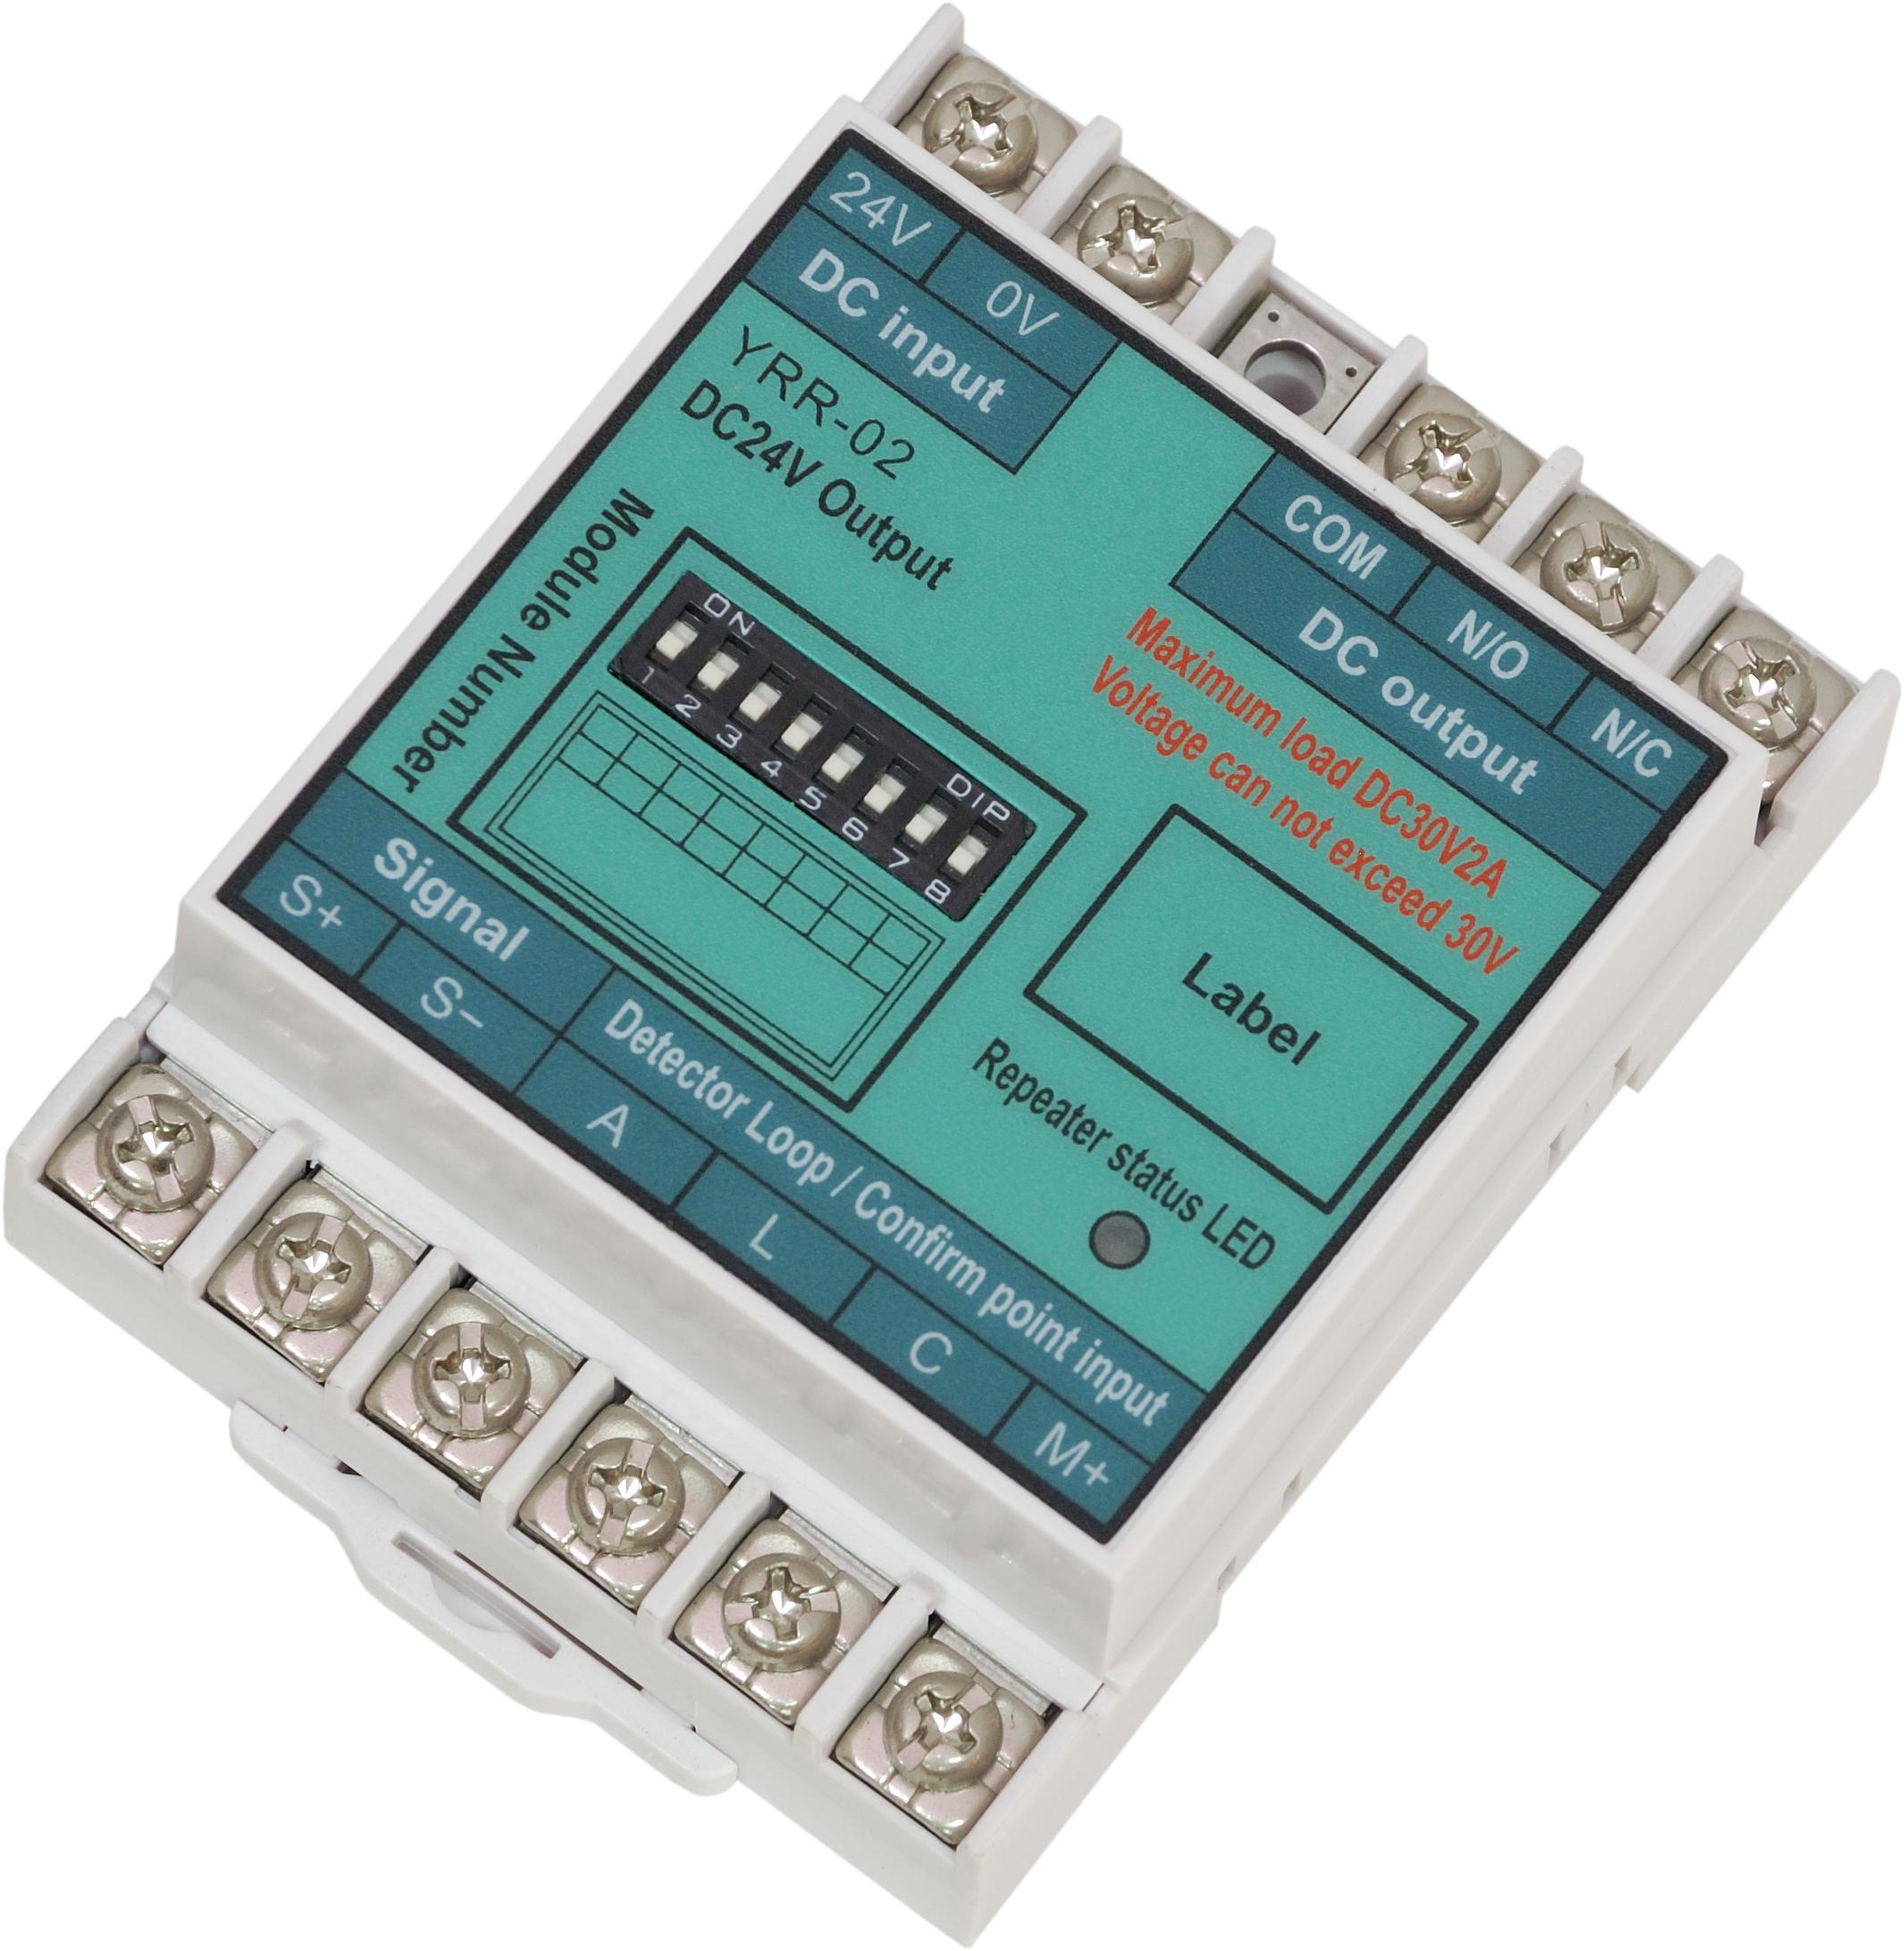 Module giám sát - điều khiển